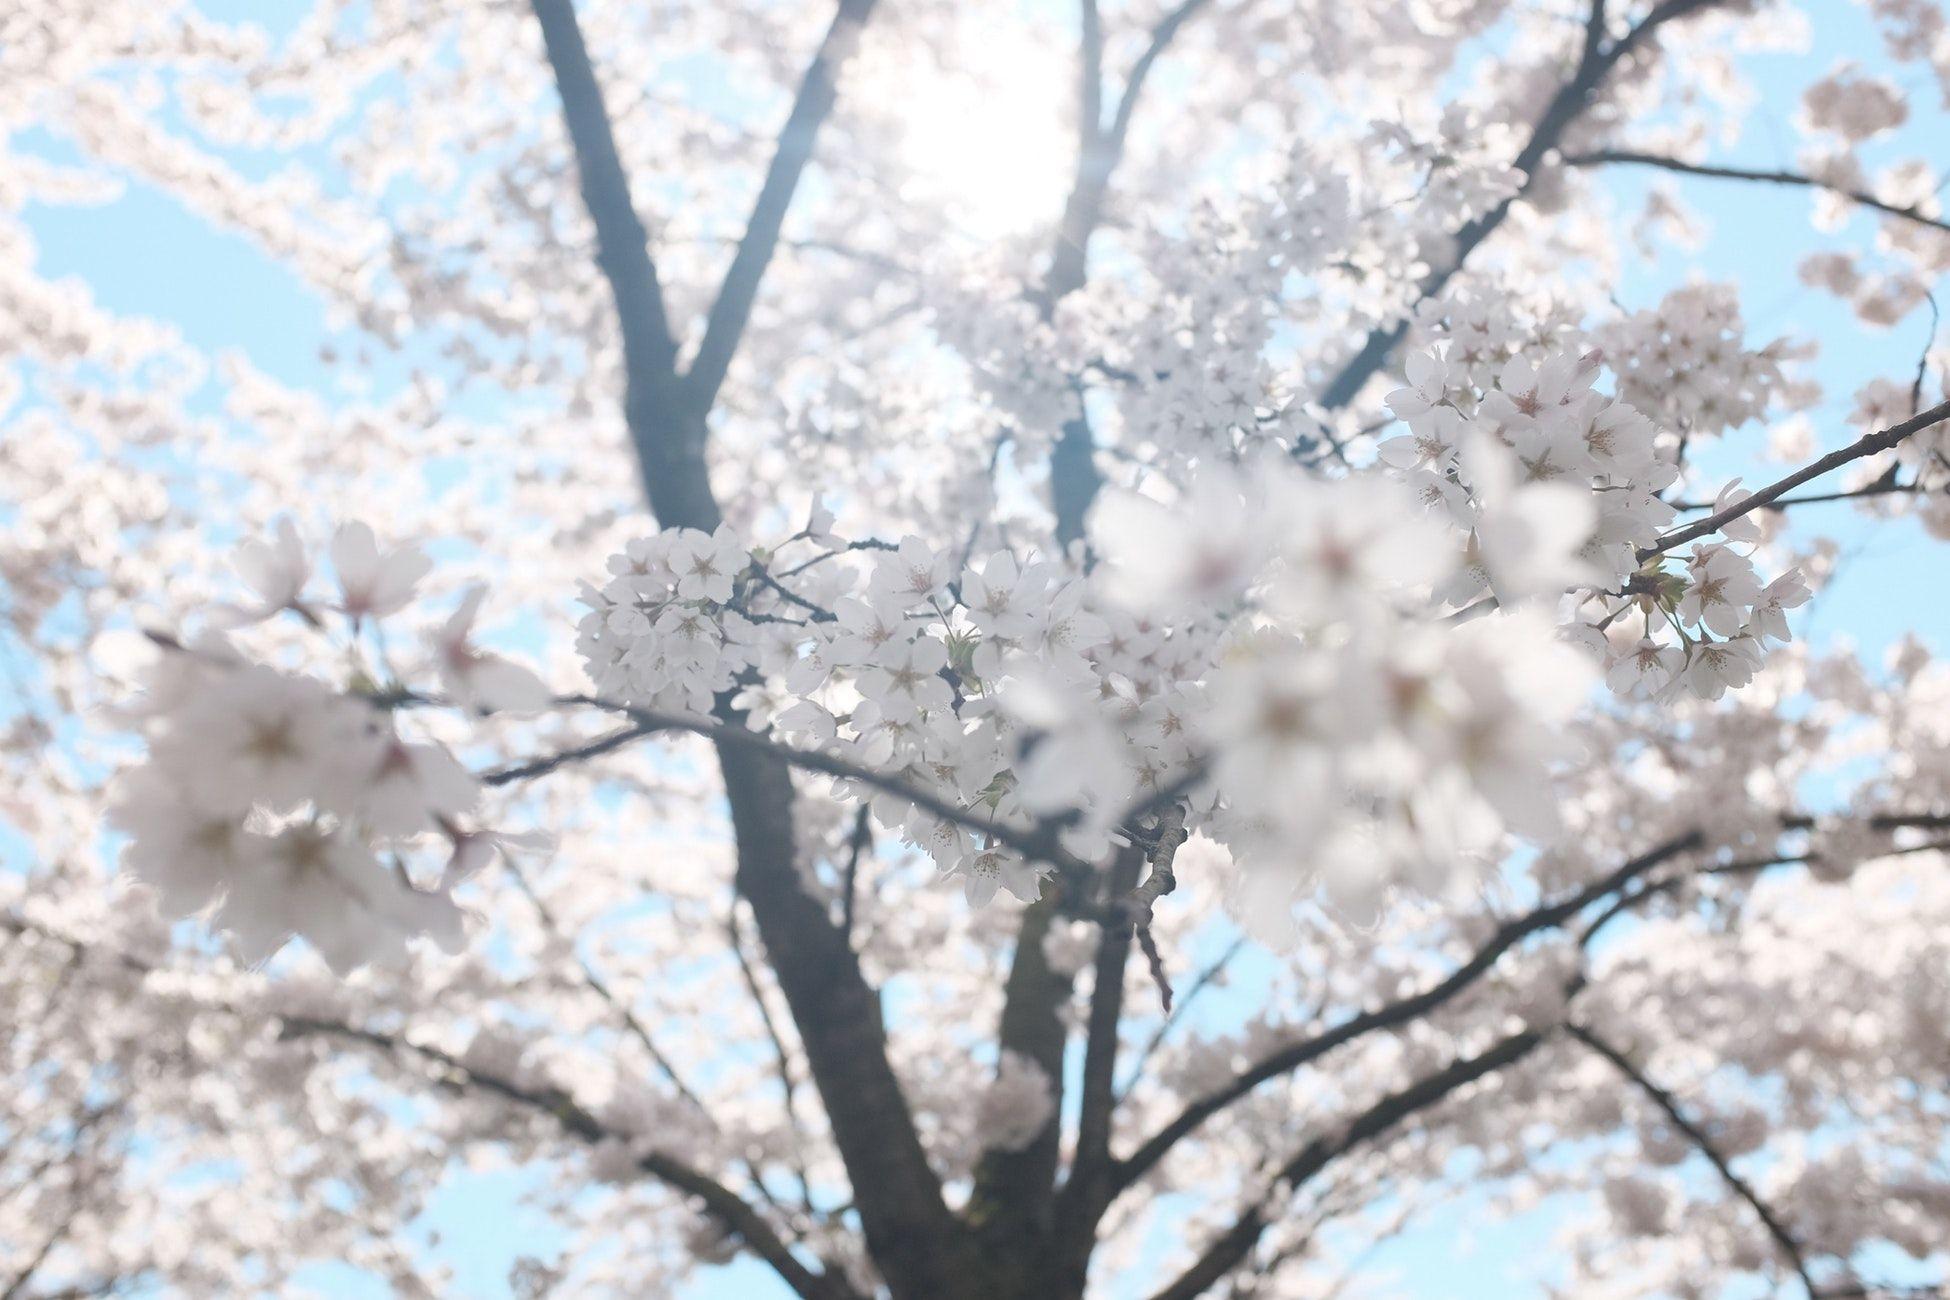 White Cherry Blossom Tree Under Clear Blue Sky White Cherry Blossom Blossom Trees Cherry Blossom Tree